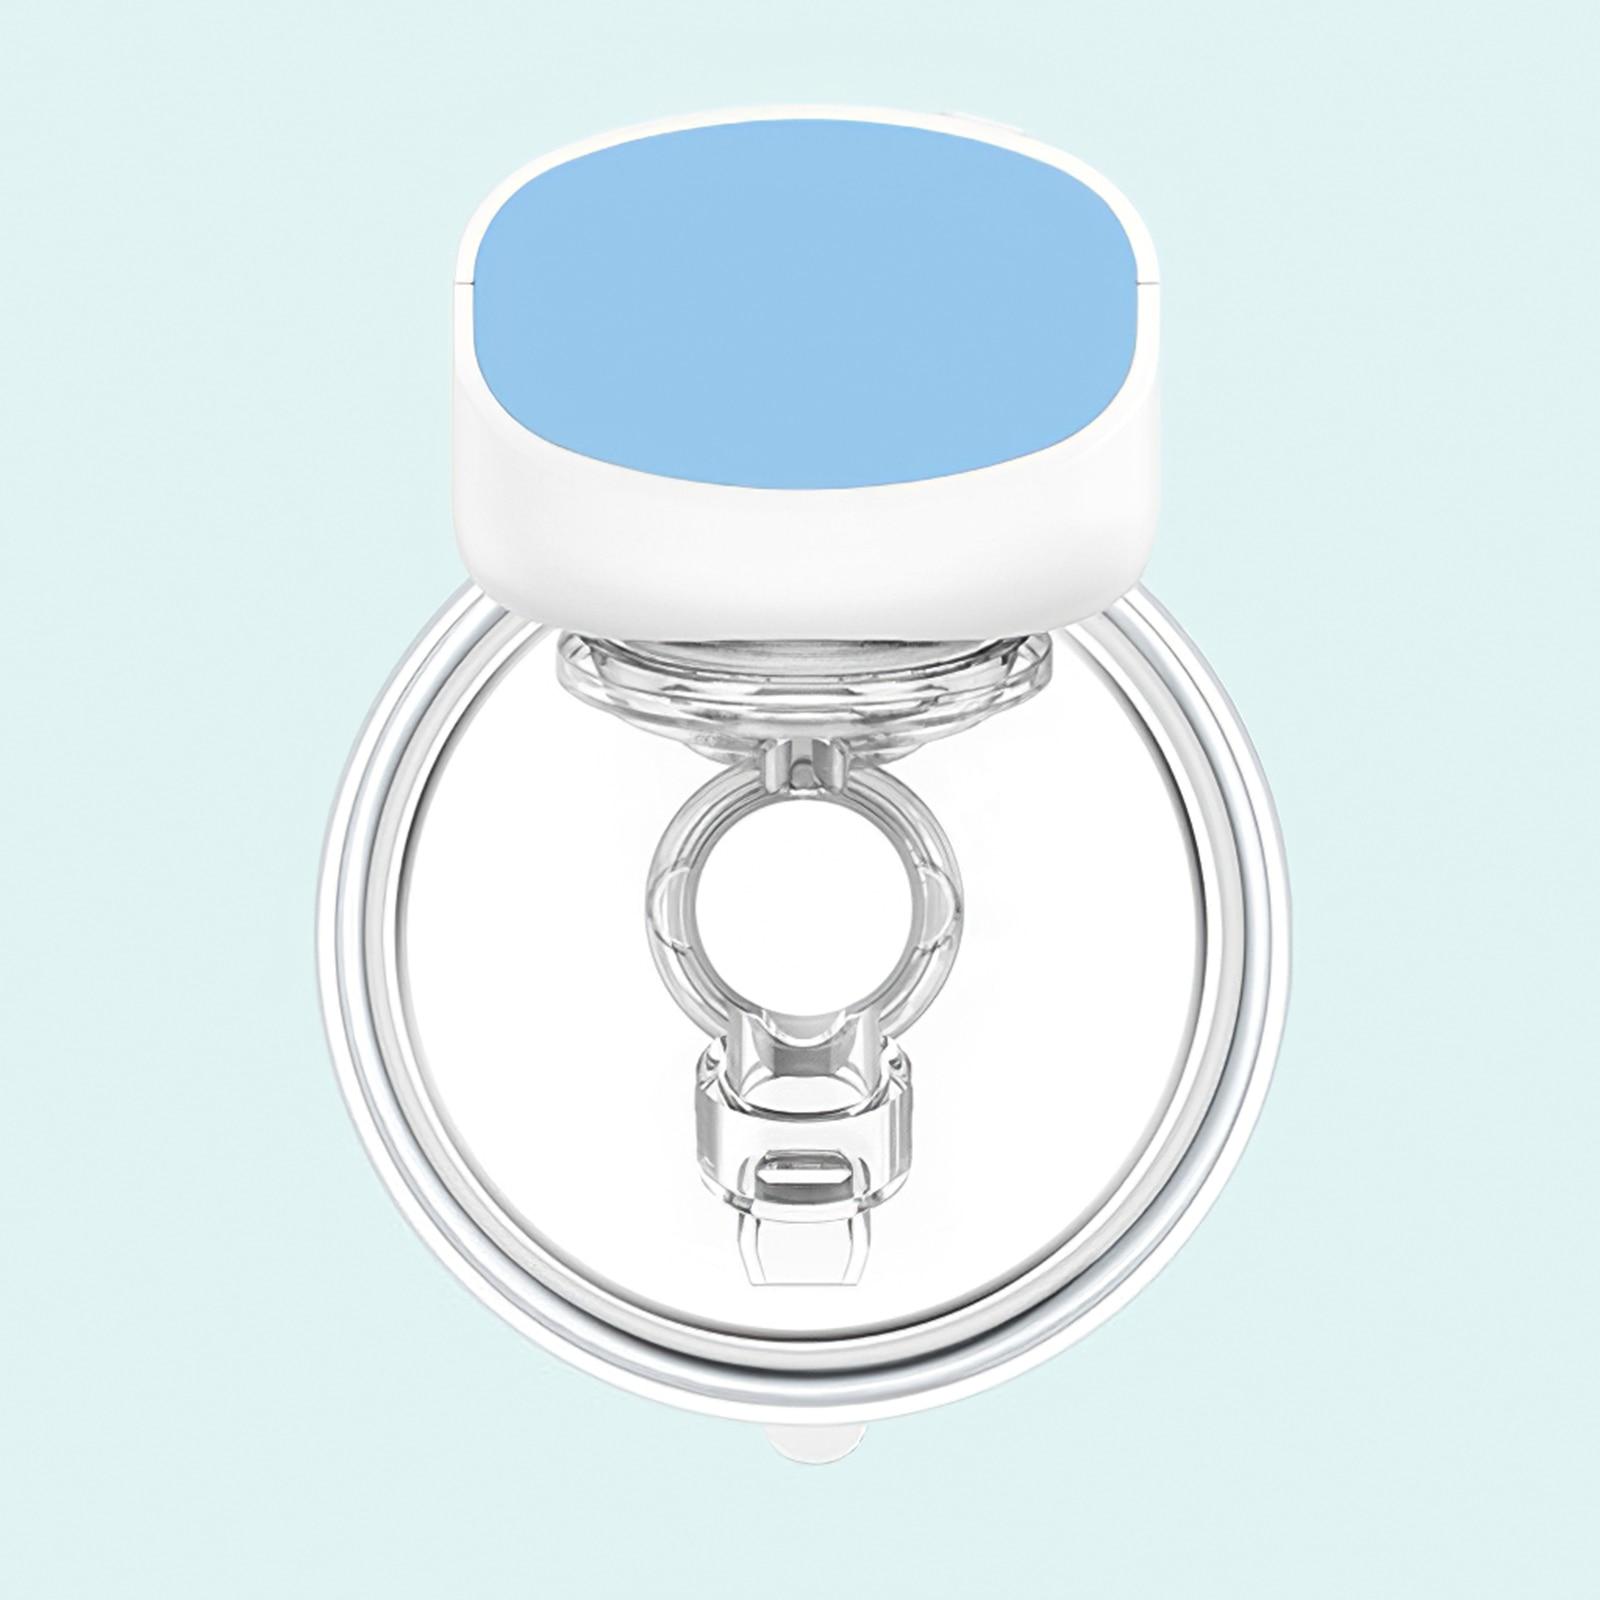 800mah Wearable Breastfeeding Pump Milk Container Nontoxic PP Milk Pump 5 Gears Milk Sucker For Pregnant Women Mothers Outdoors